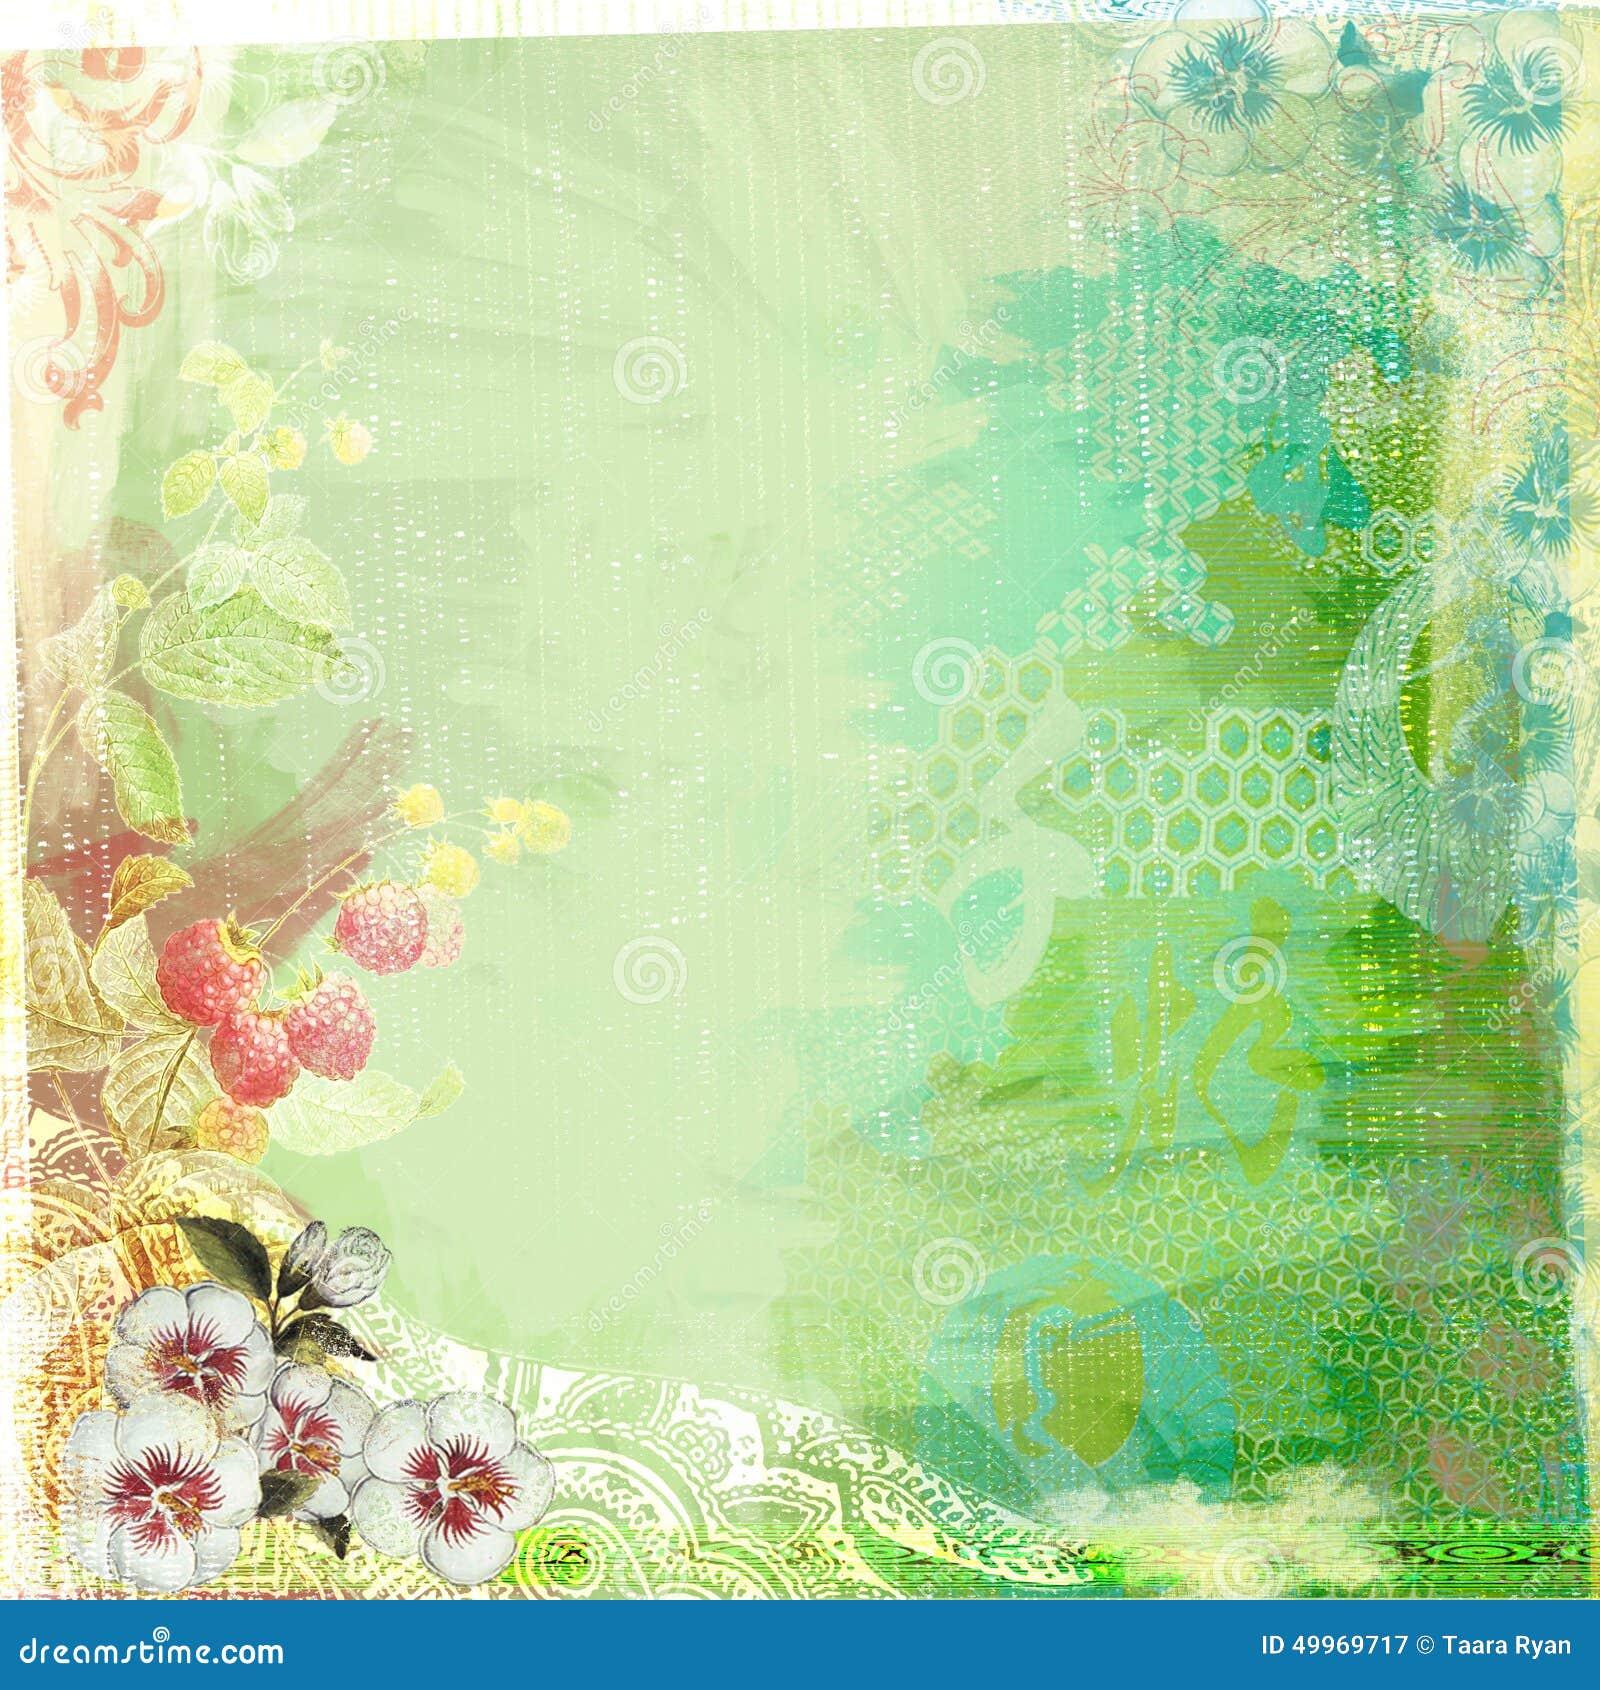 Background image 300 dpi - Boho Teatime Grunge Paper Background Green Royalty Free Stock Photography